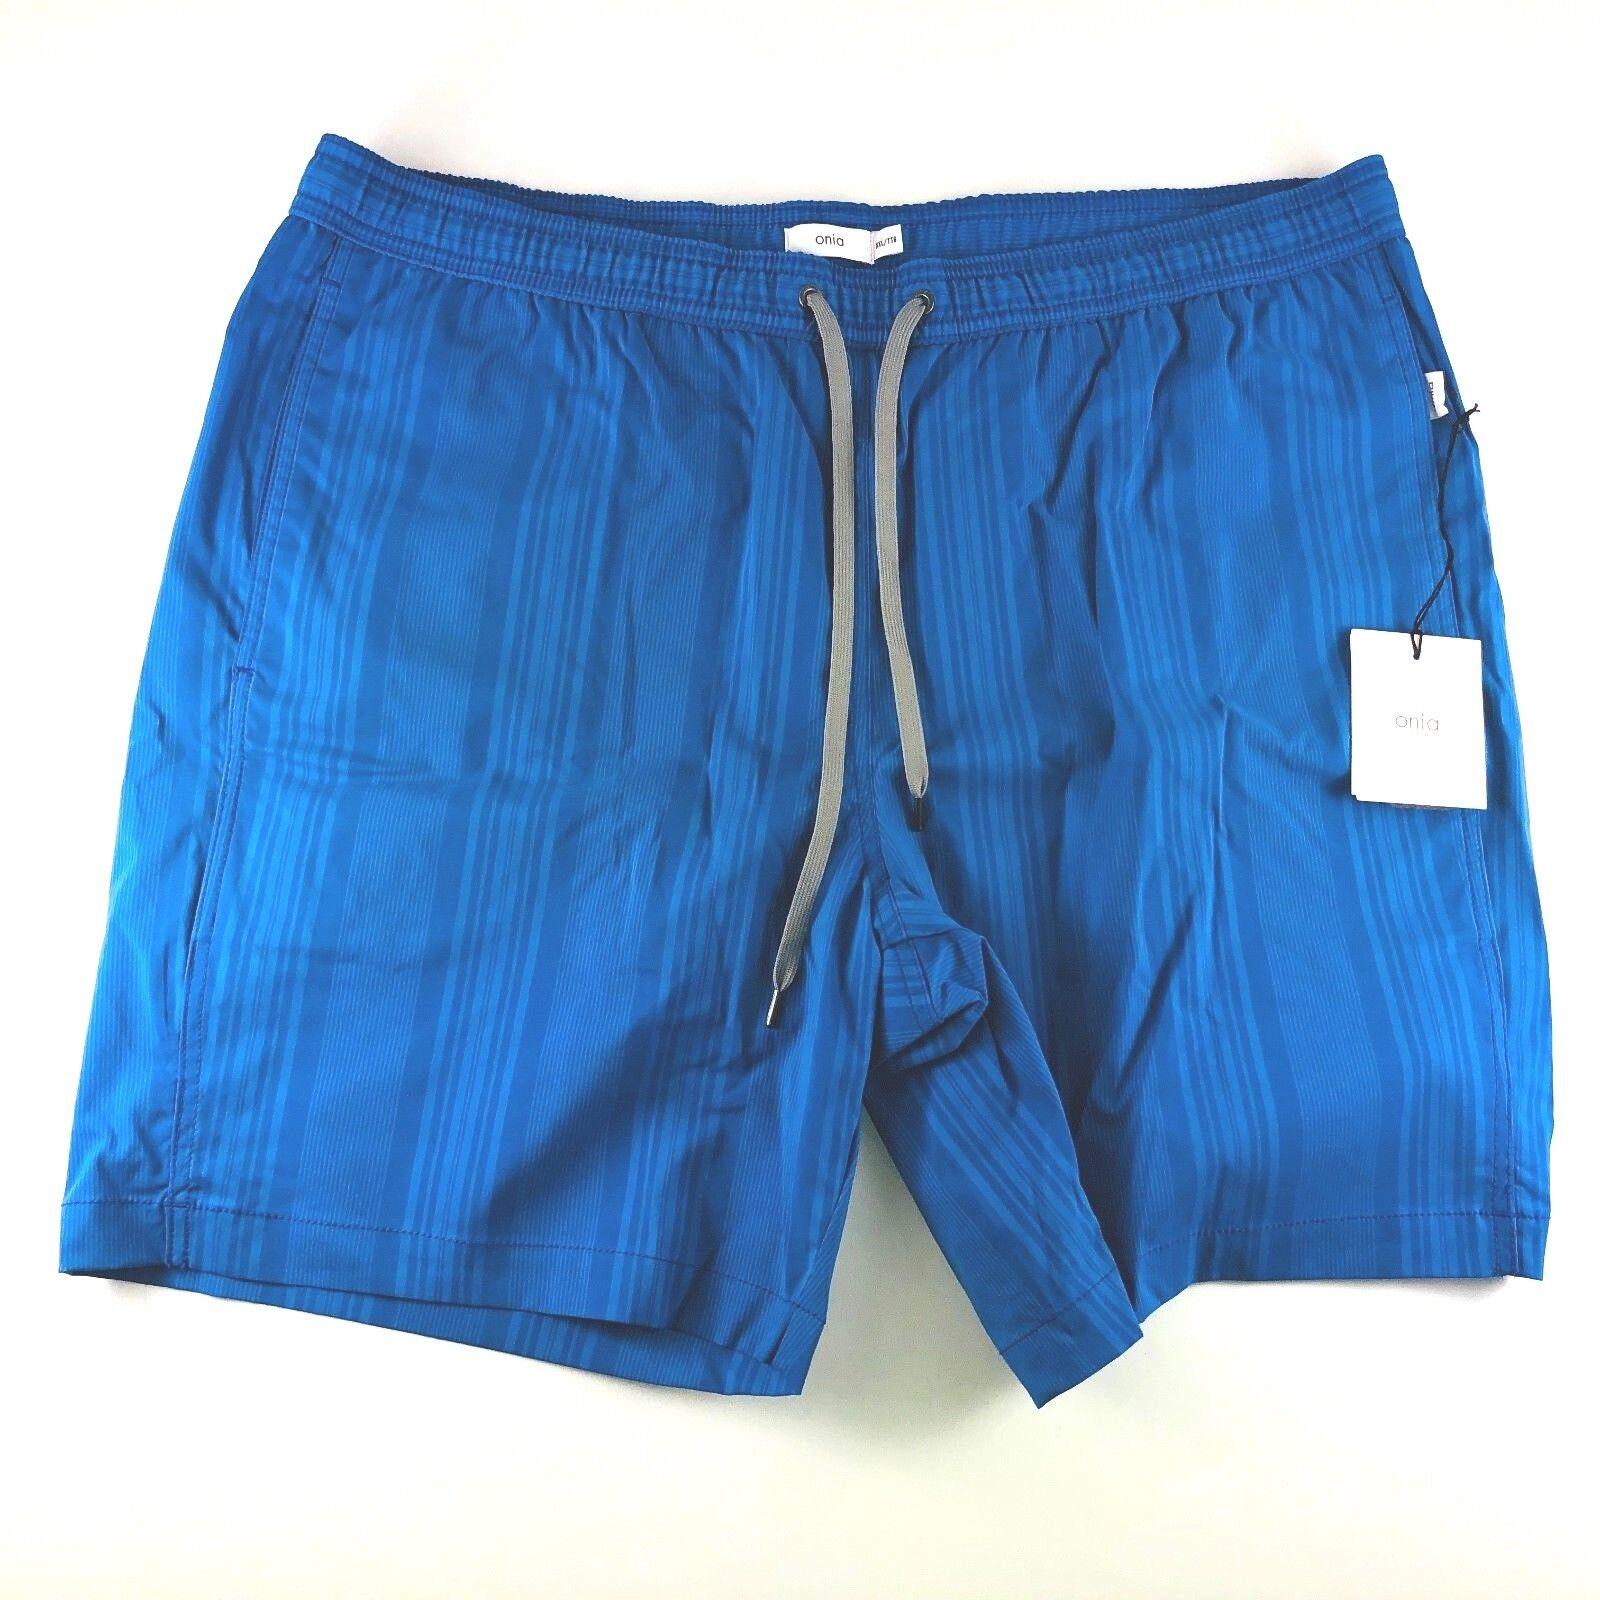 Onia Charles Trunks Tonal Multio Stripe 8 Inch Swim Shorts Mens XXL NWT